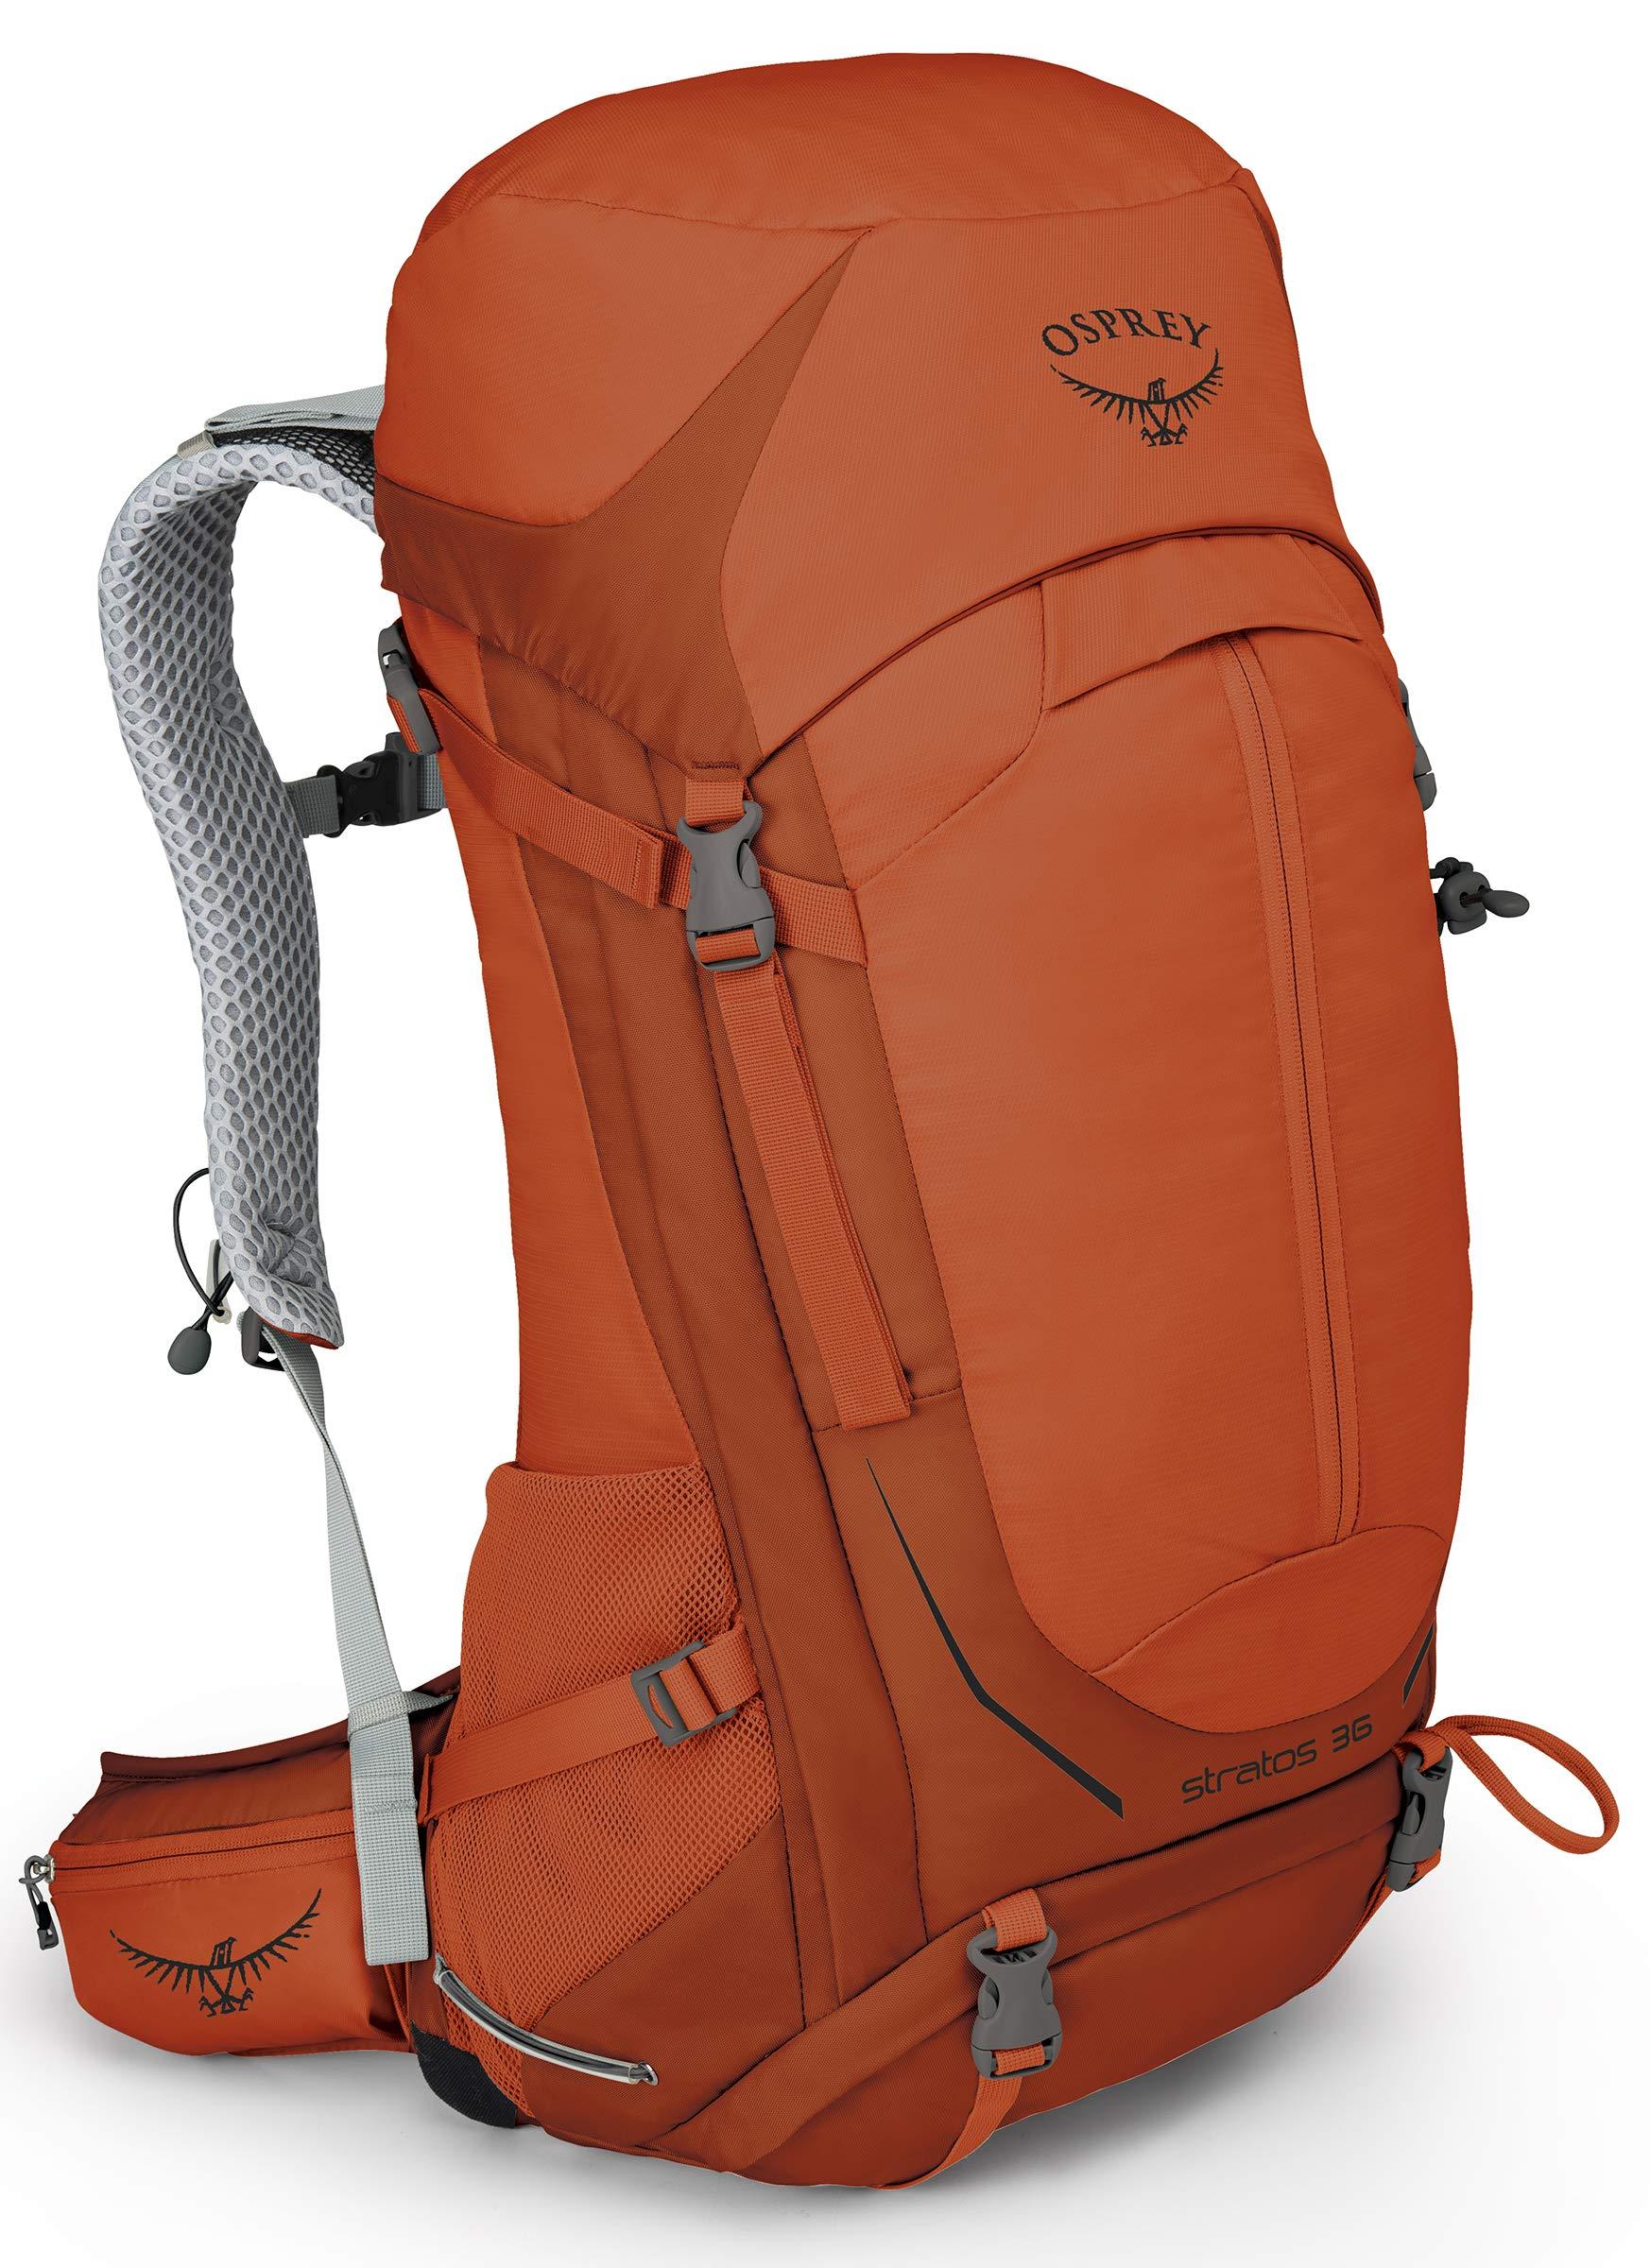 Osprey Packs Stratos 36 Hiking Backpack, Sungrazer Orange, Small/Medium